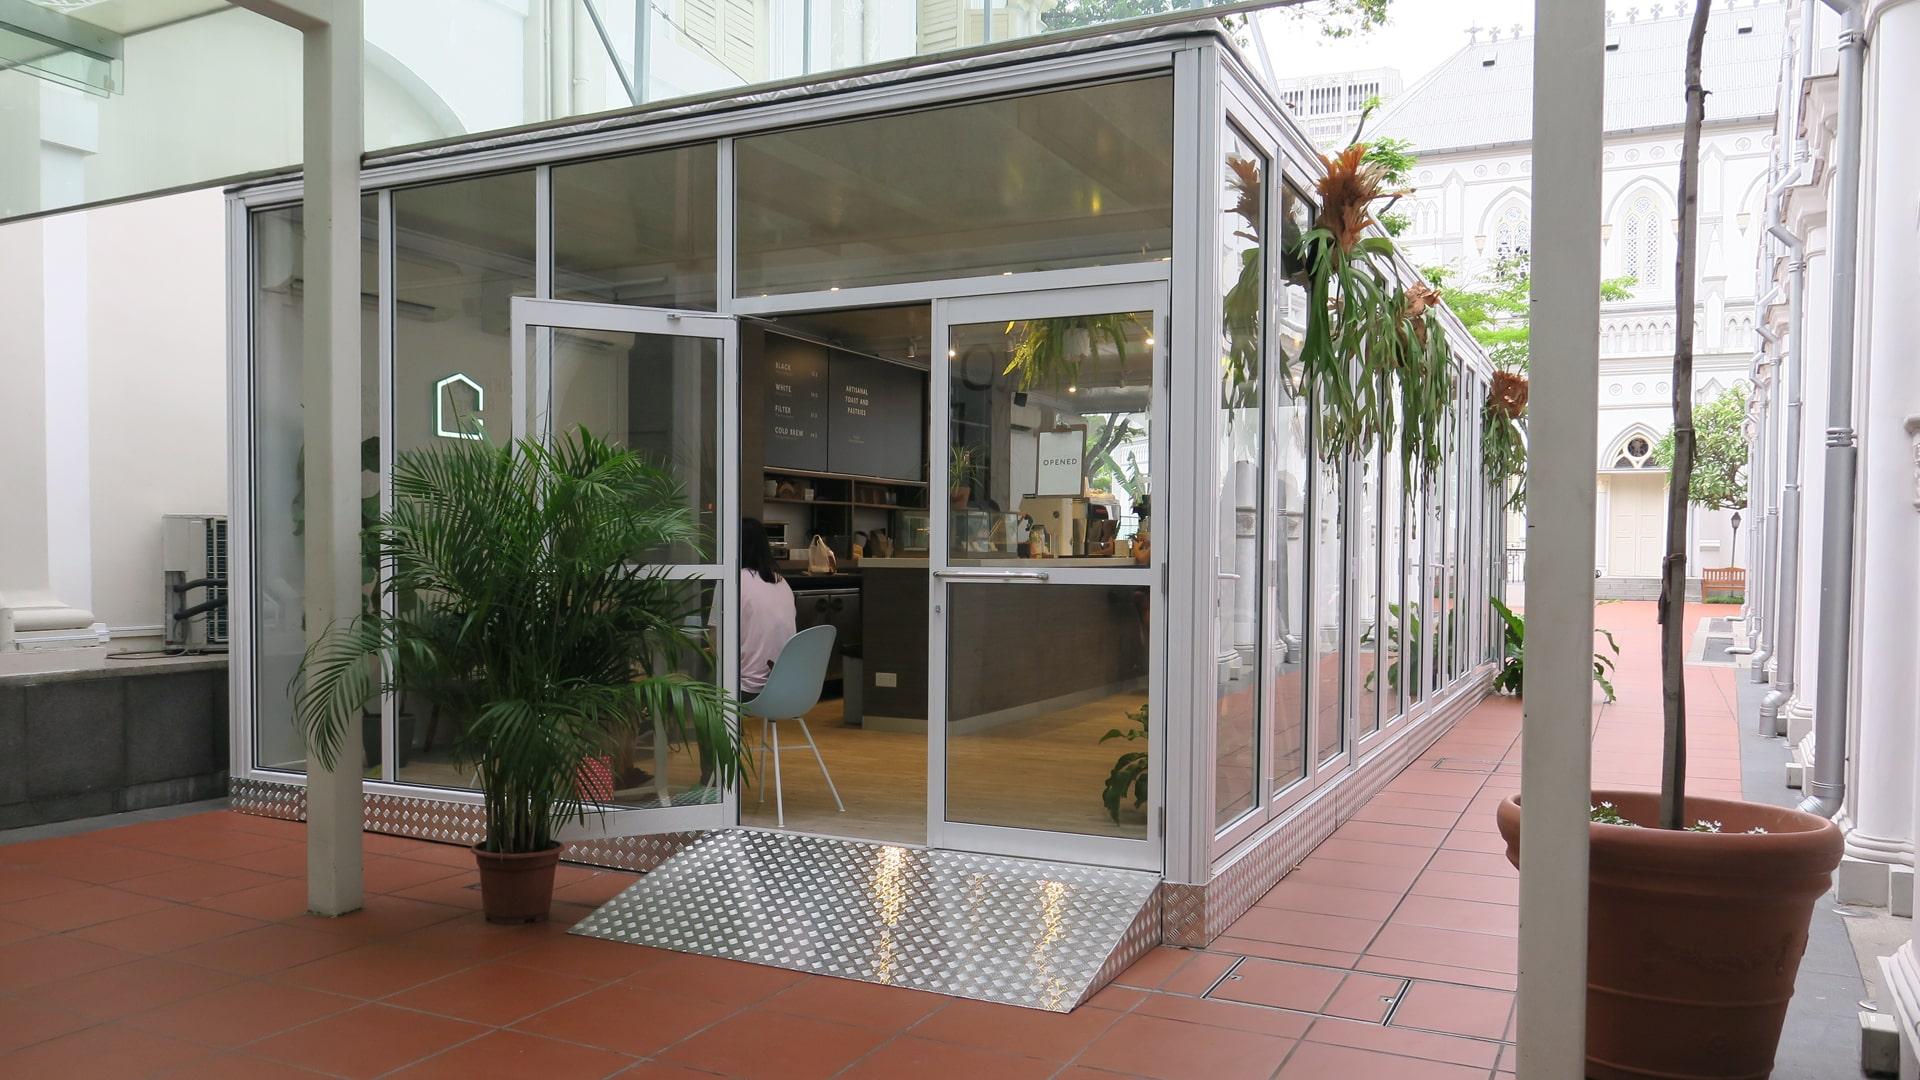 tsc_opt-images_tubelar-system_chijmes-glasshouse-pop-up-cafe-1920x1080-03-min